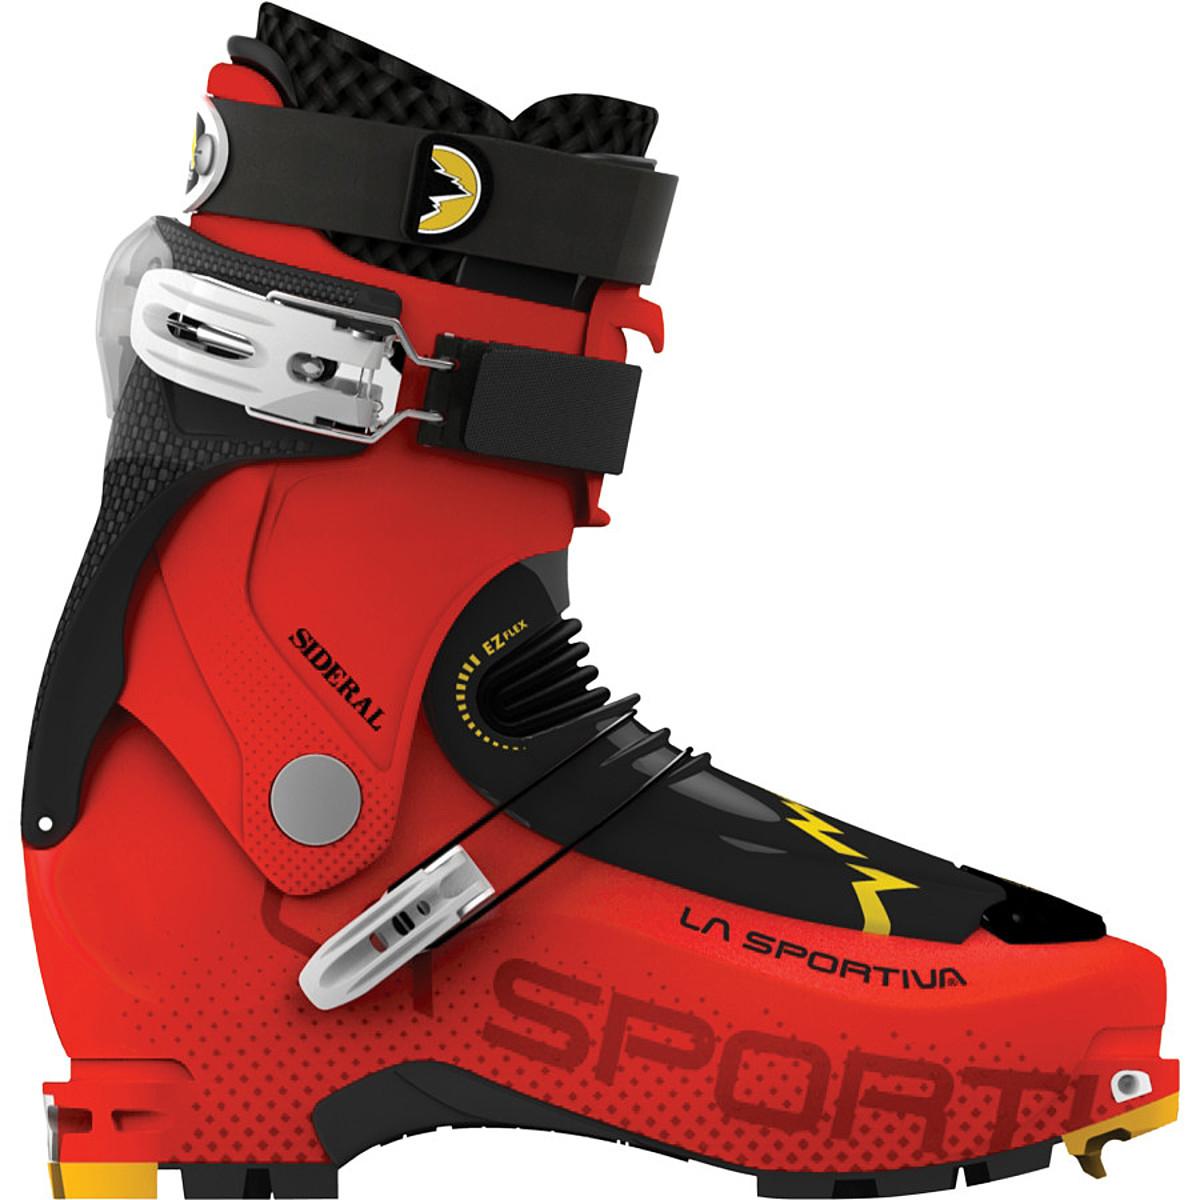 photo of a La Sportiva ski/snowshoe product